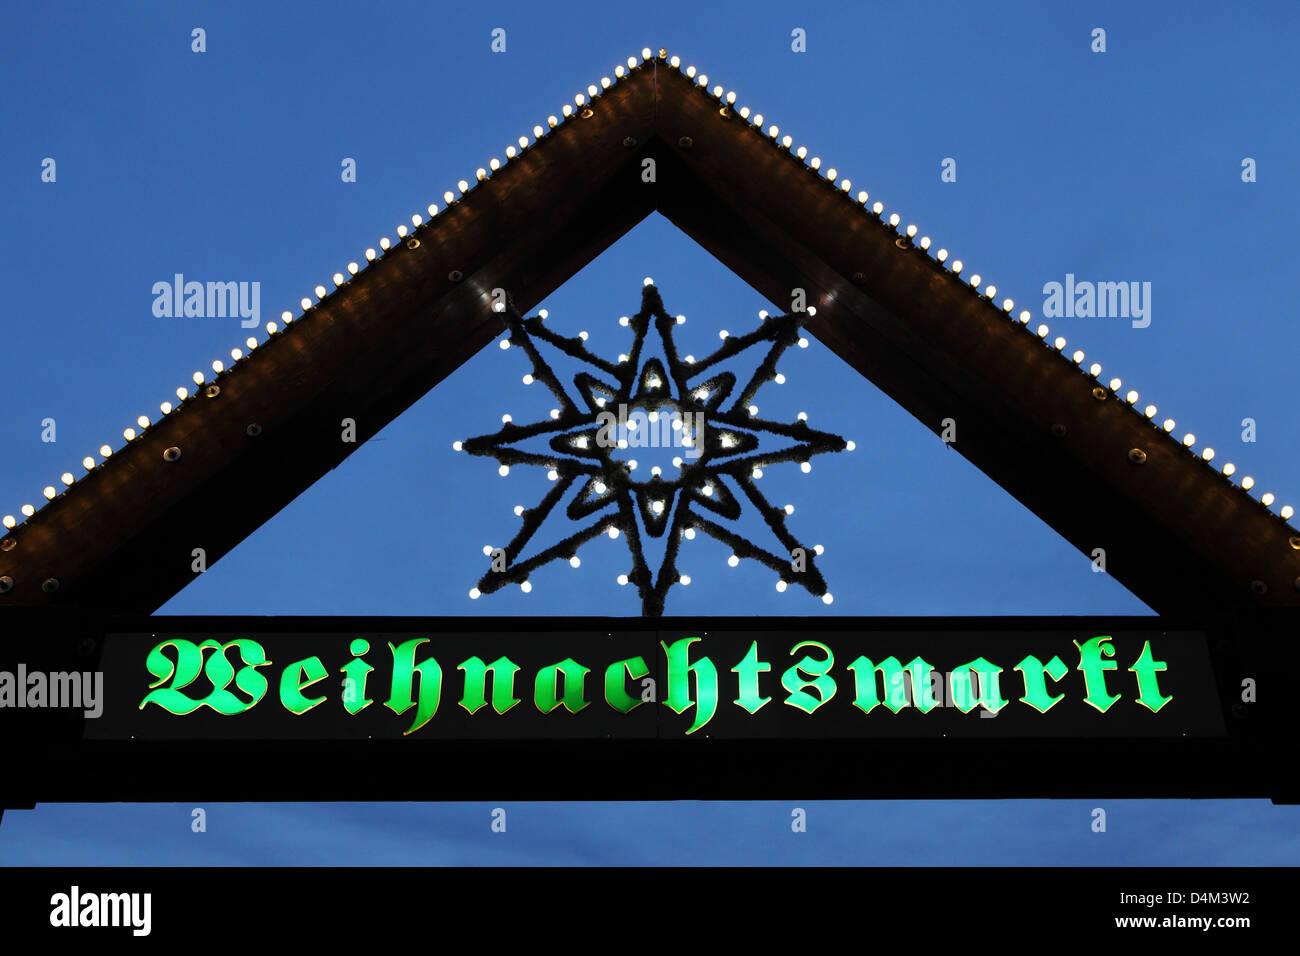 Sign for the Christmas Market (Weihnachtsmarkt) in Stuttgart, Germany. - Stock Image